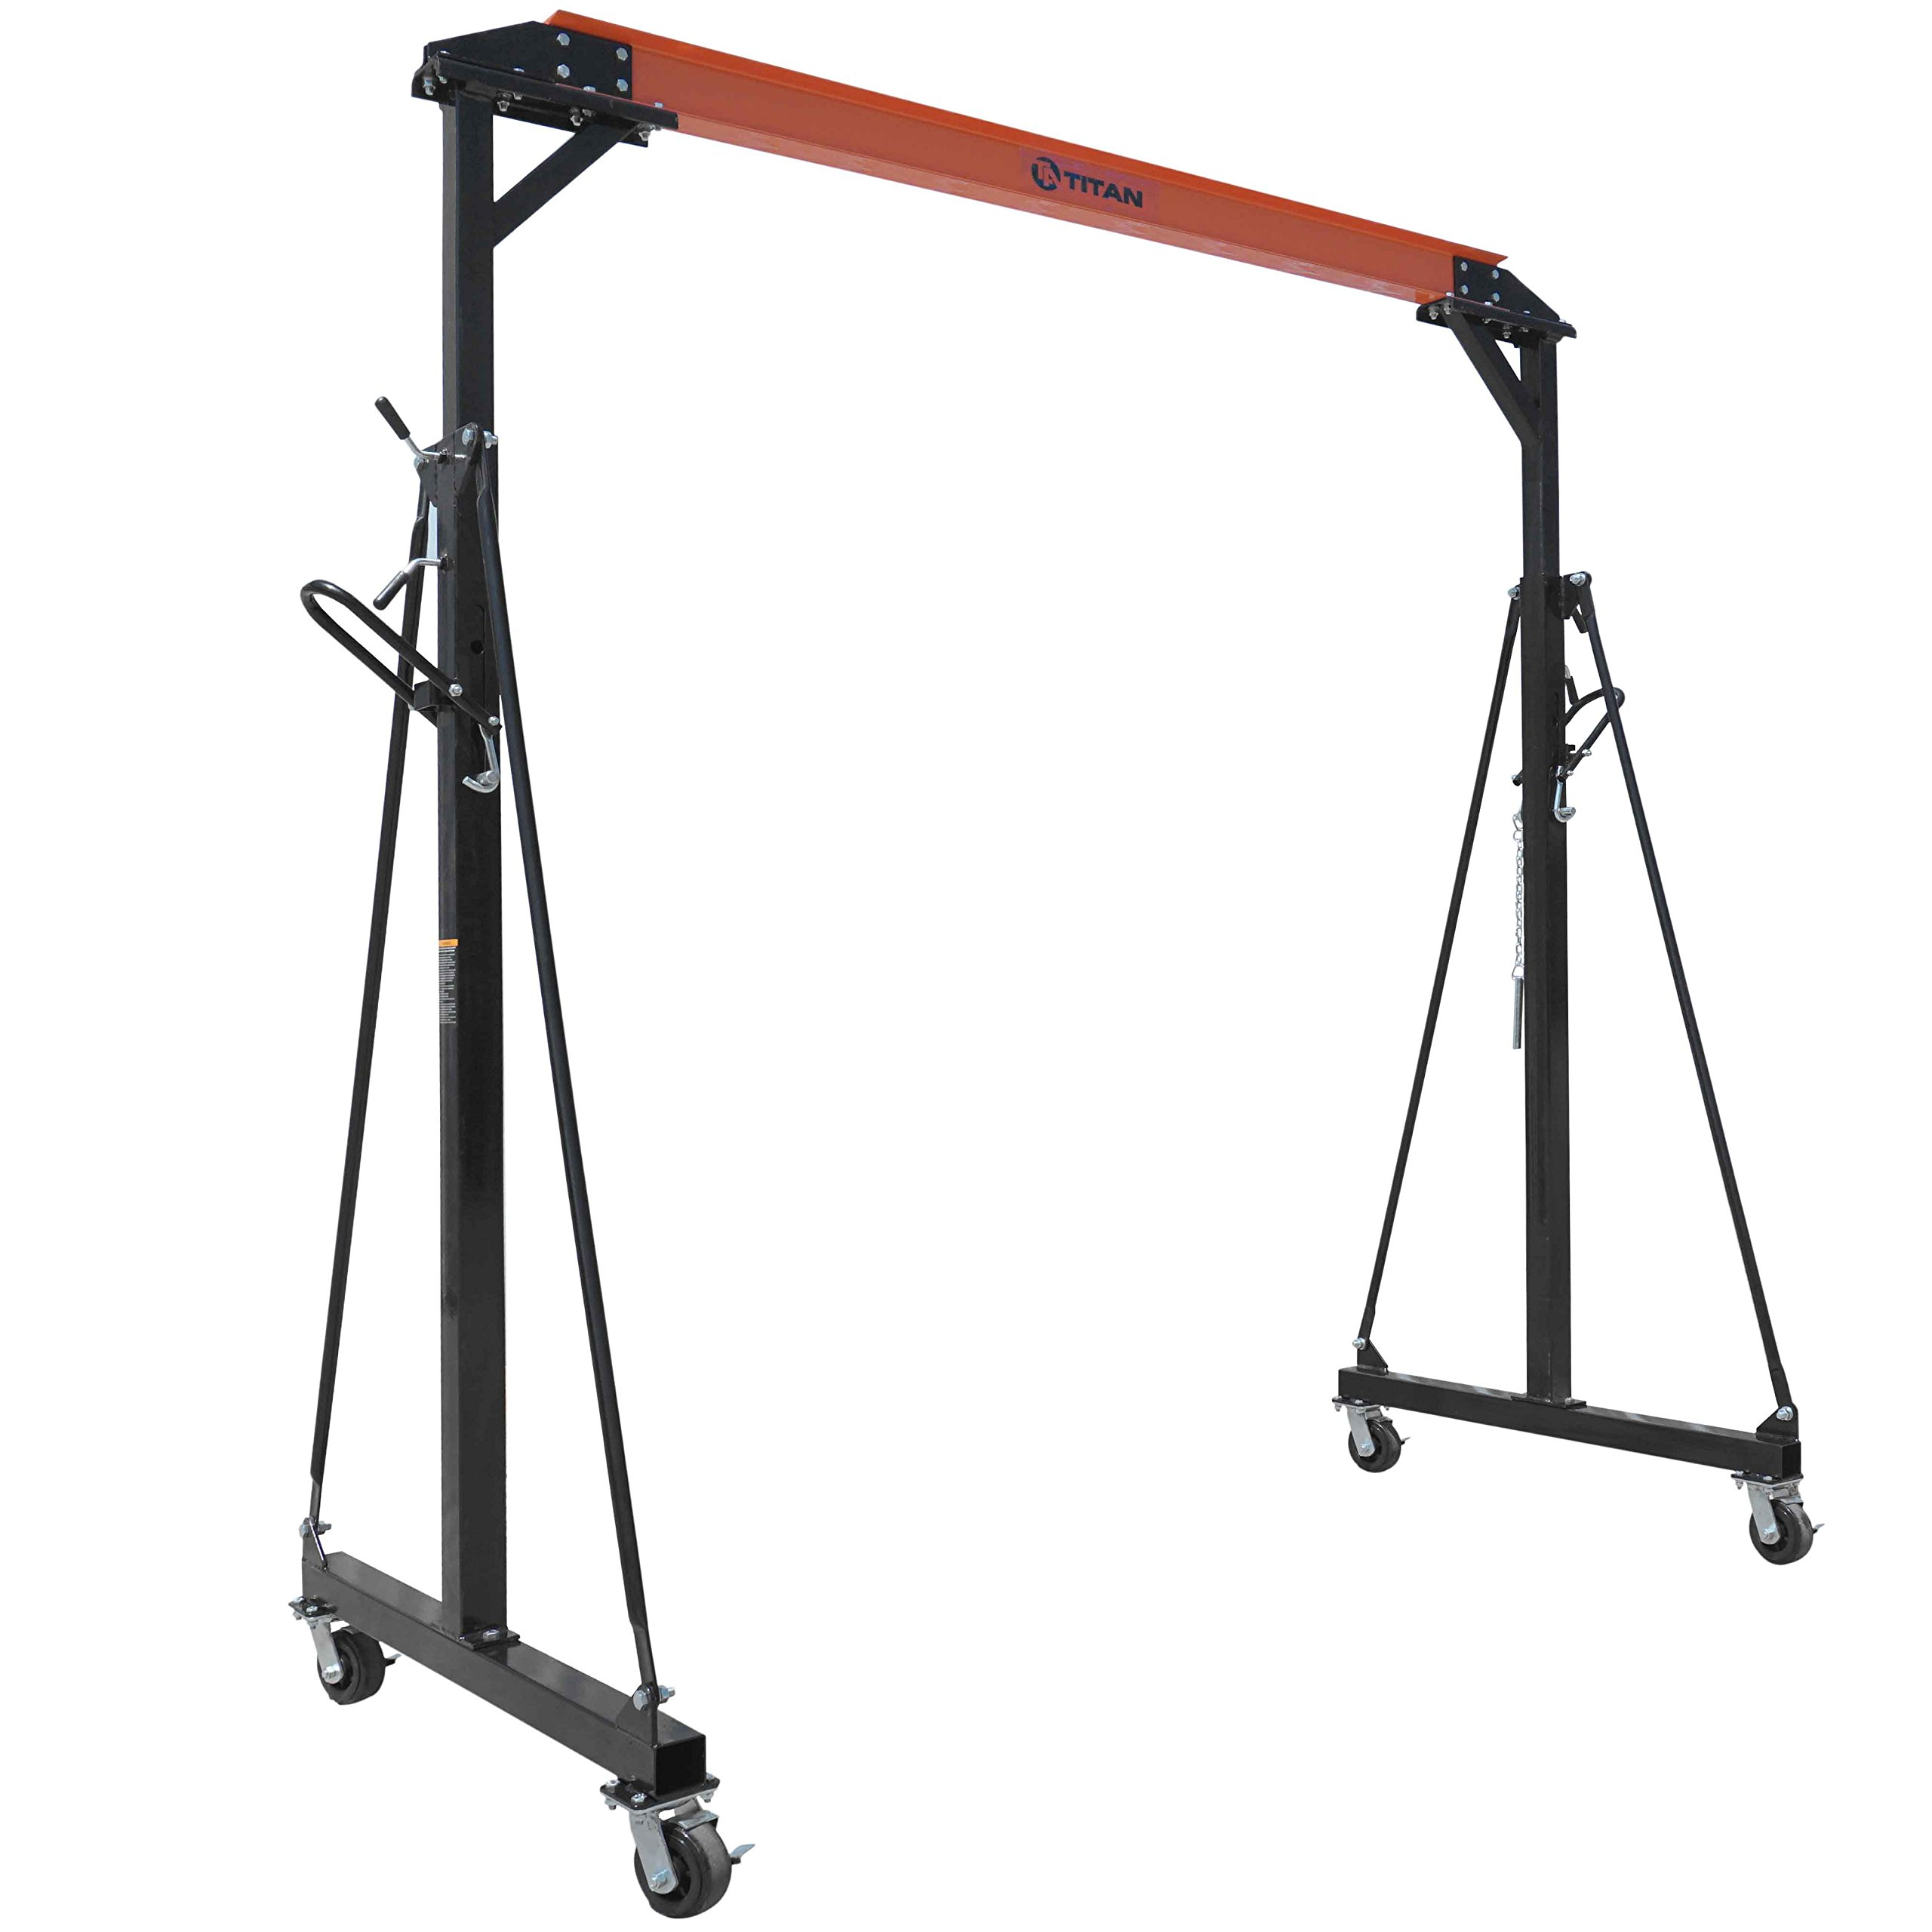 Titan Adjustable Gantry Crane (2000 lb Capacity)